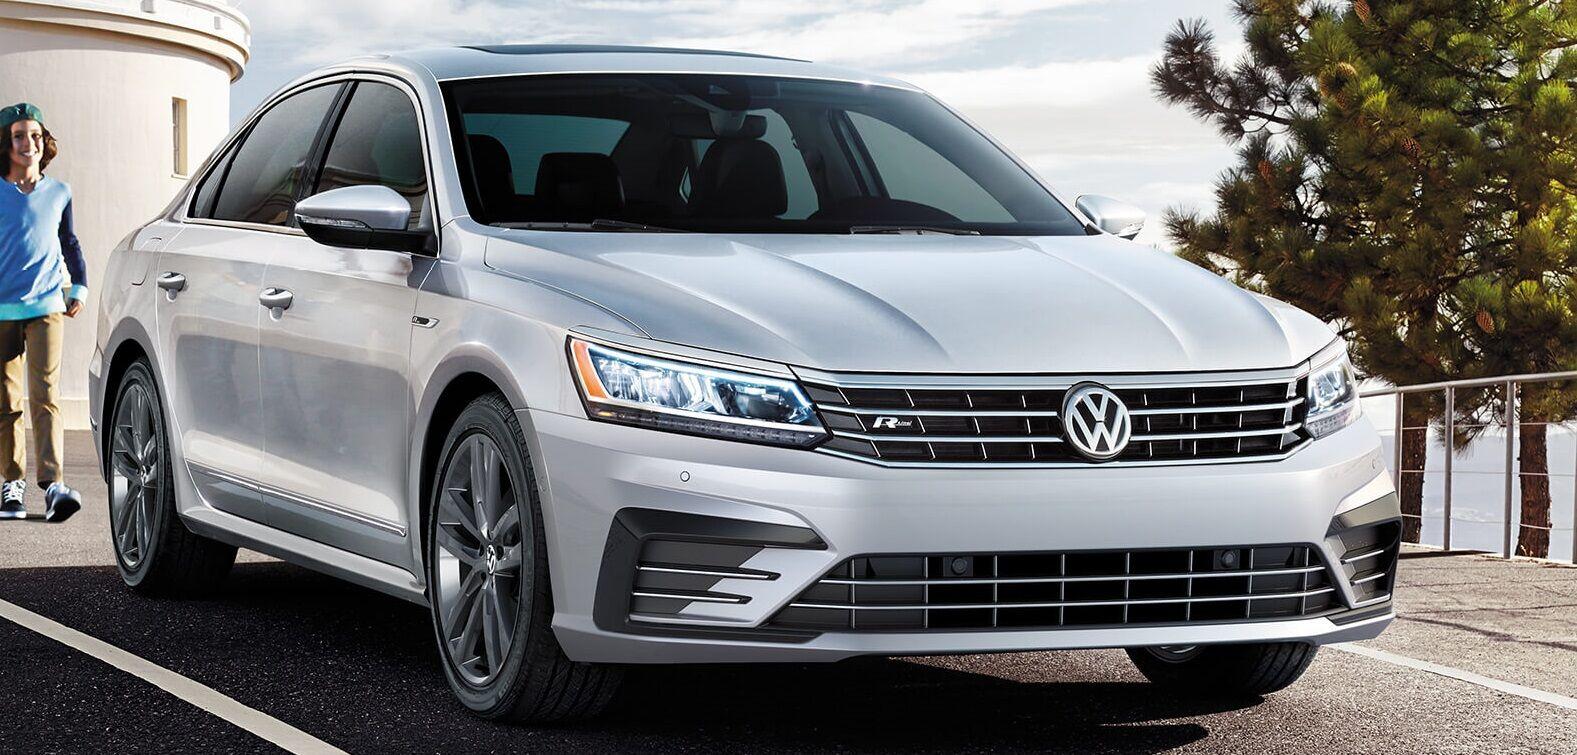 A Silver 2019 VW Passat